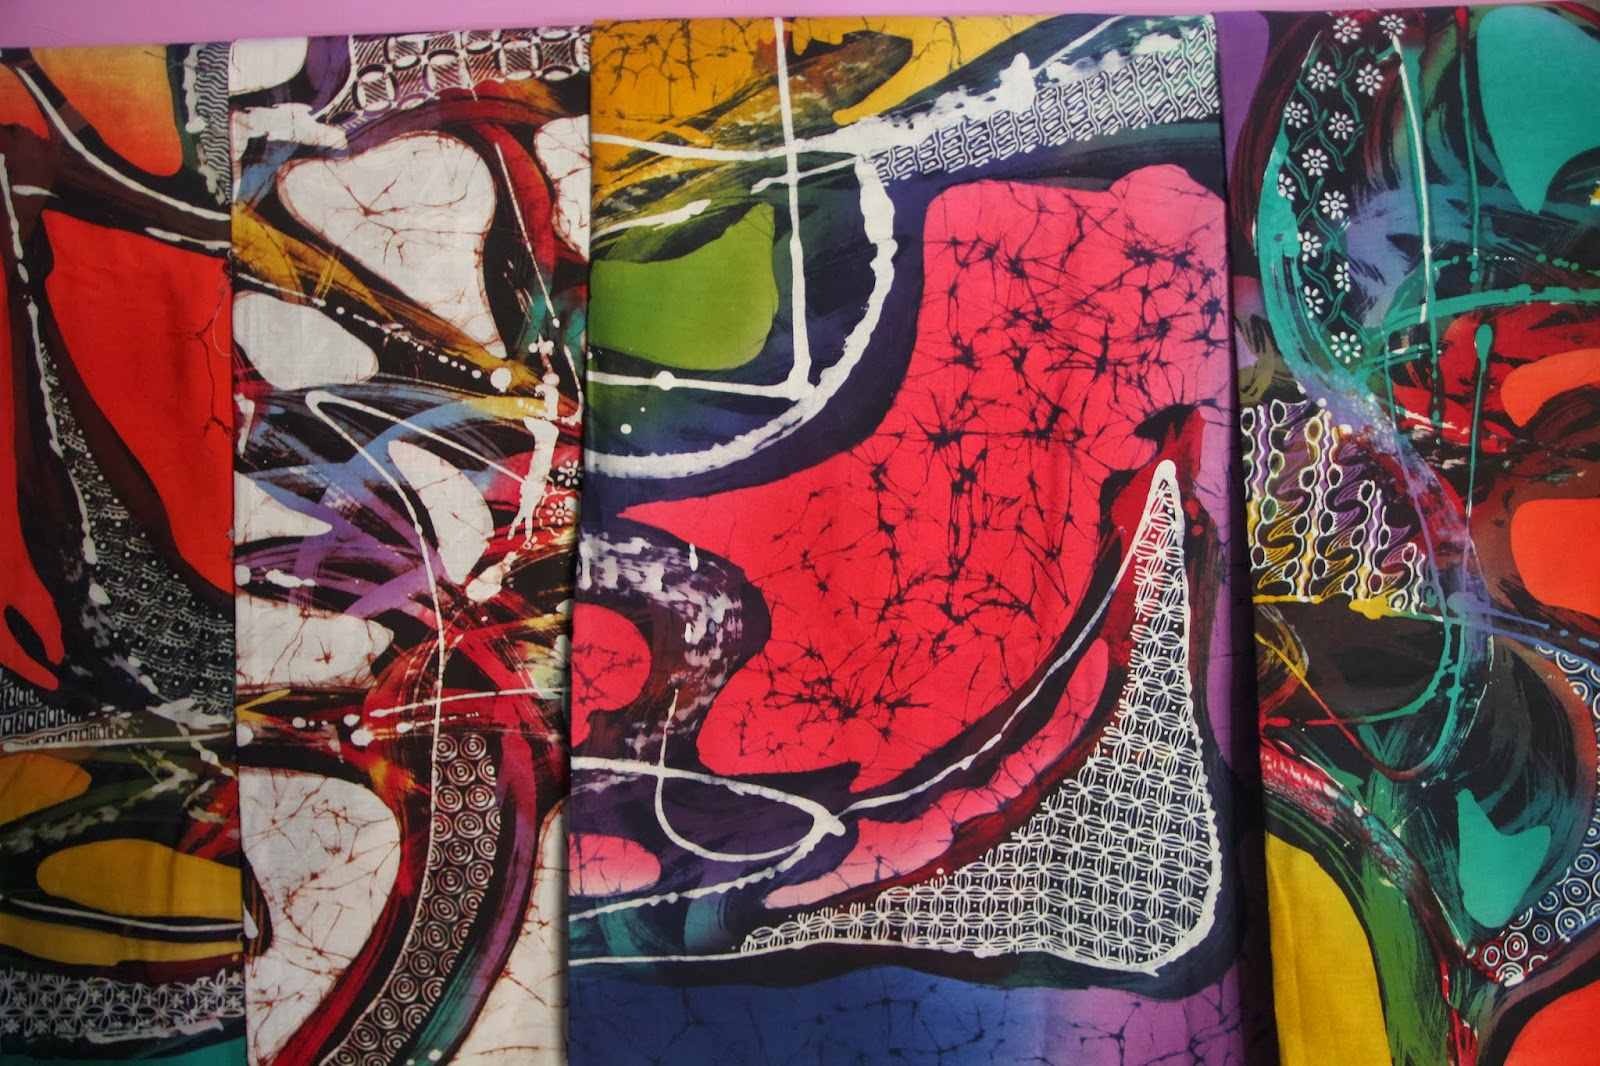 Indonesian Abstrak Batik: Batik ARJI SM: Harga Kain Batik Motif Abstrak